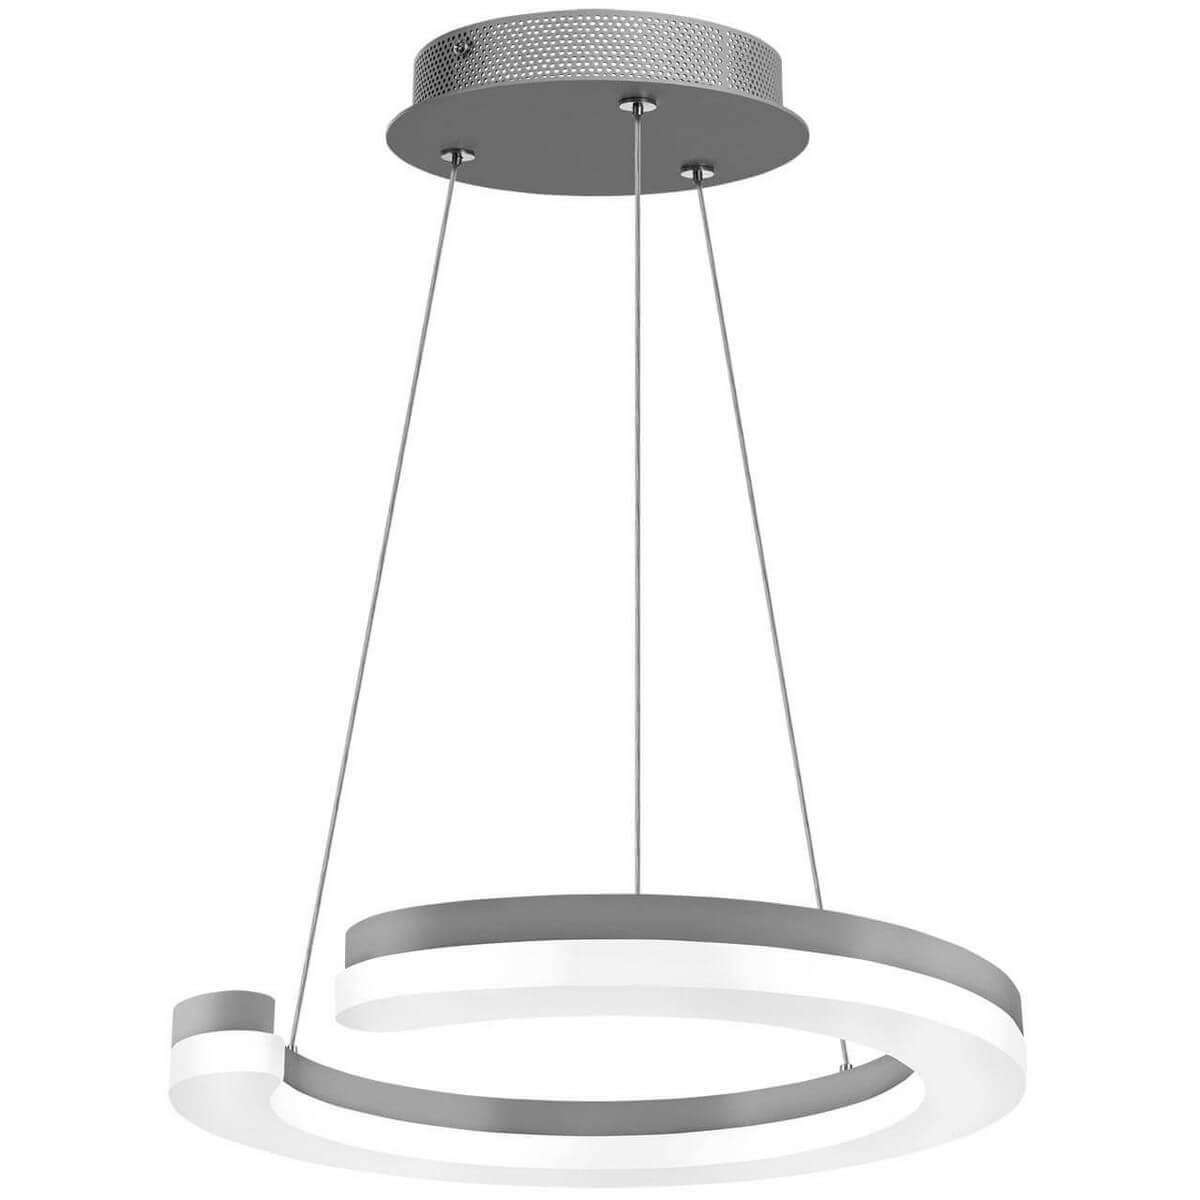 Светильник Lightstar 763249 Unitario подвесной светильник unitario 763246